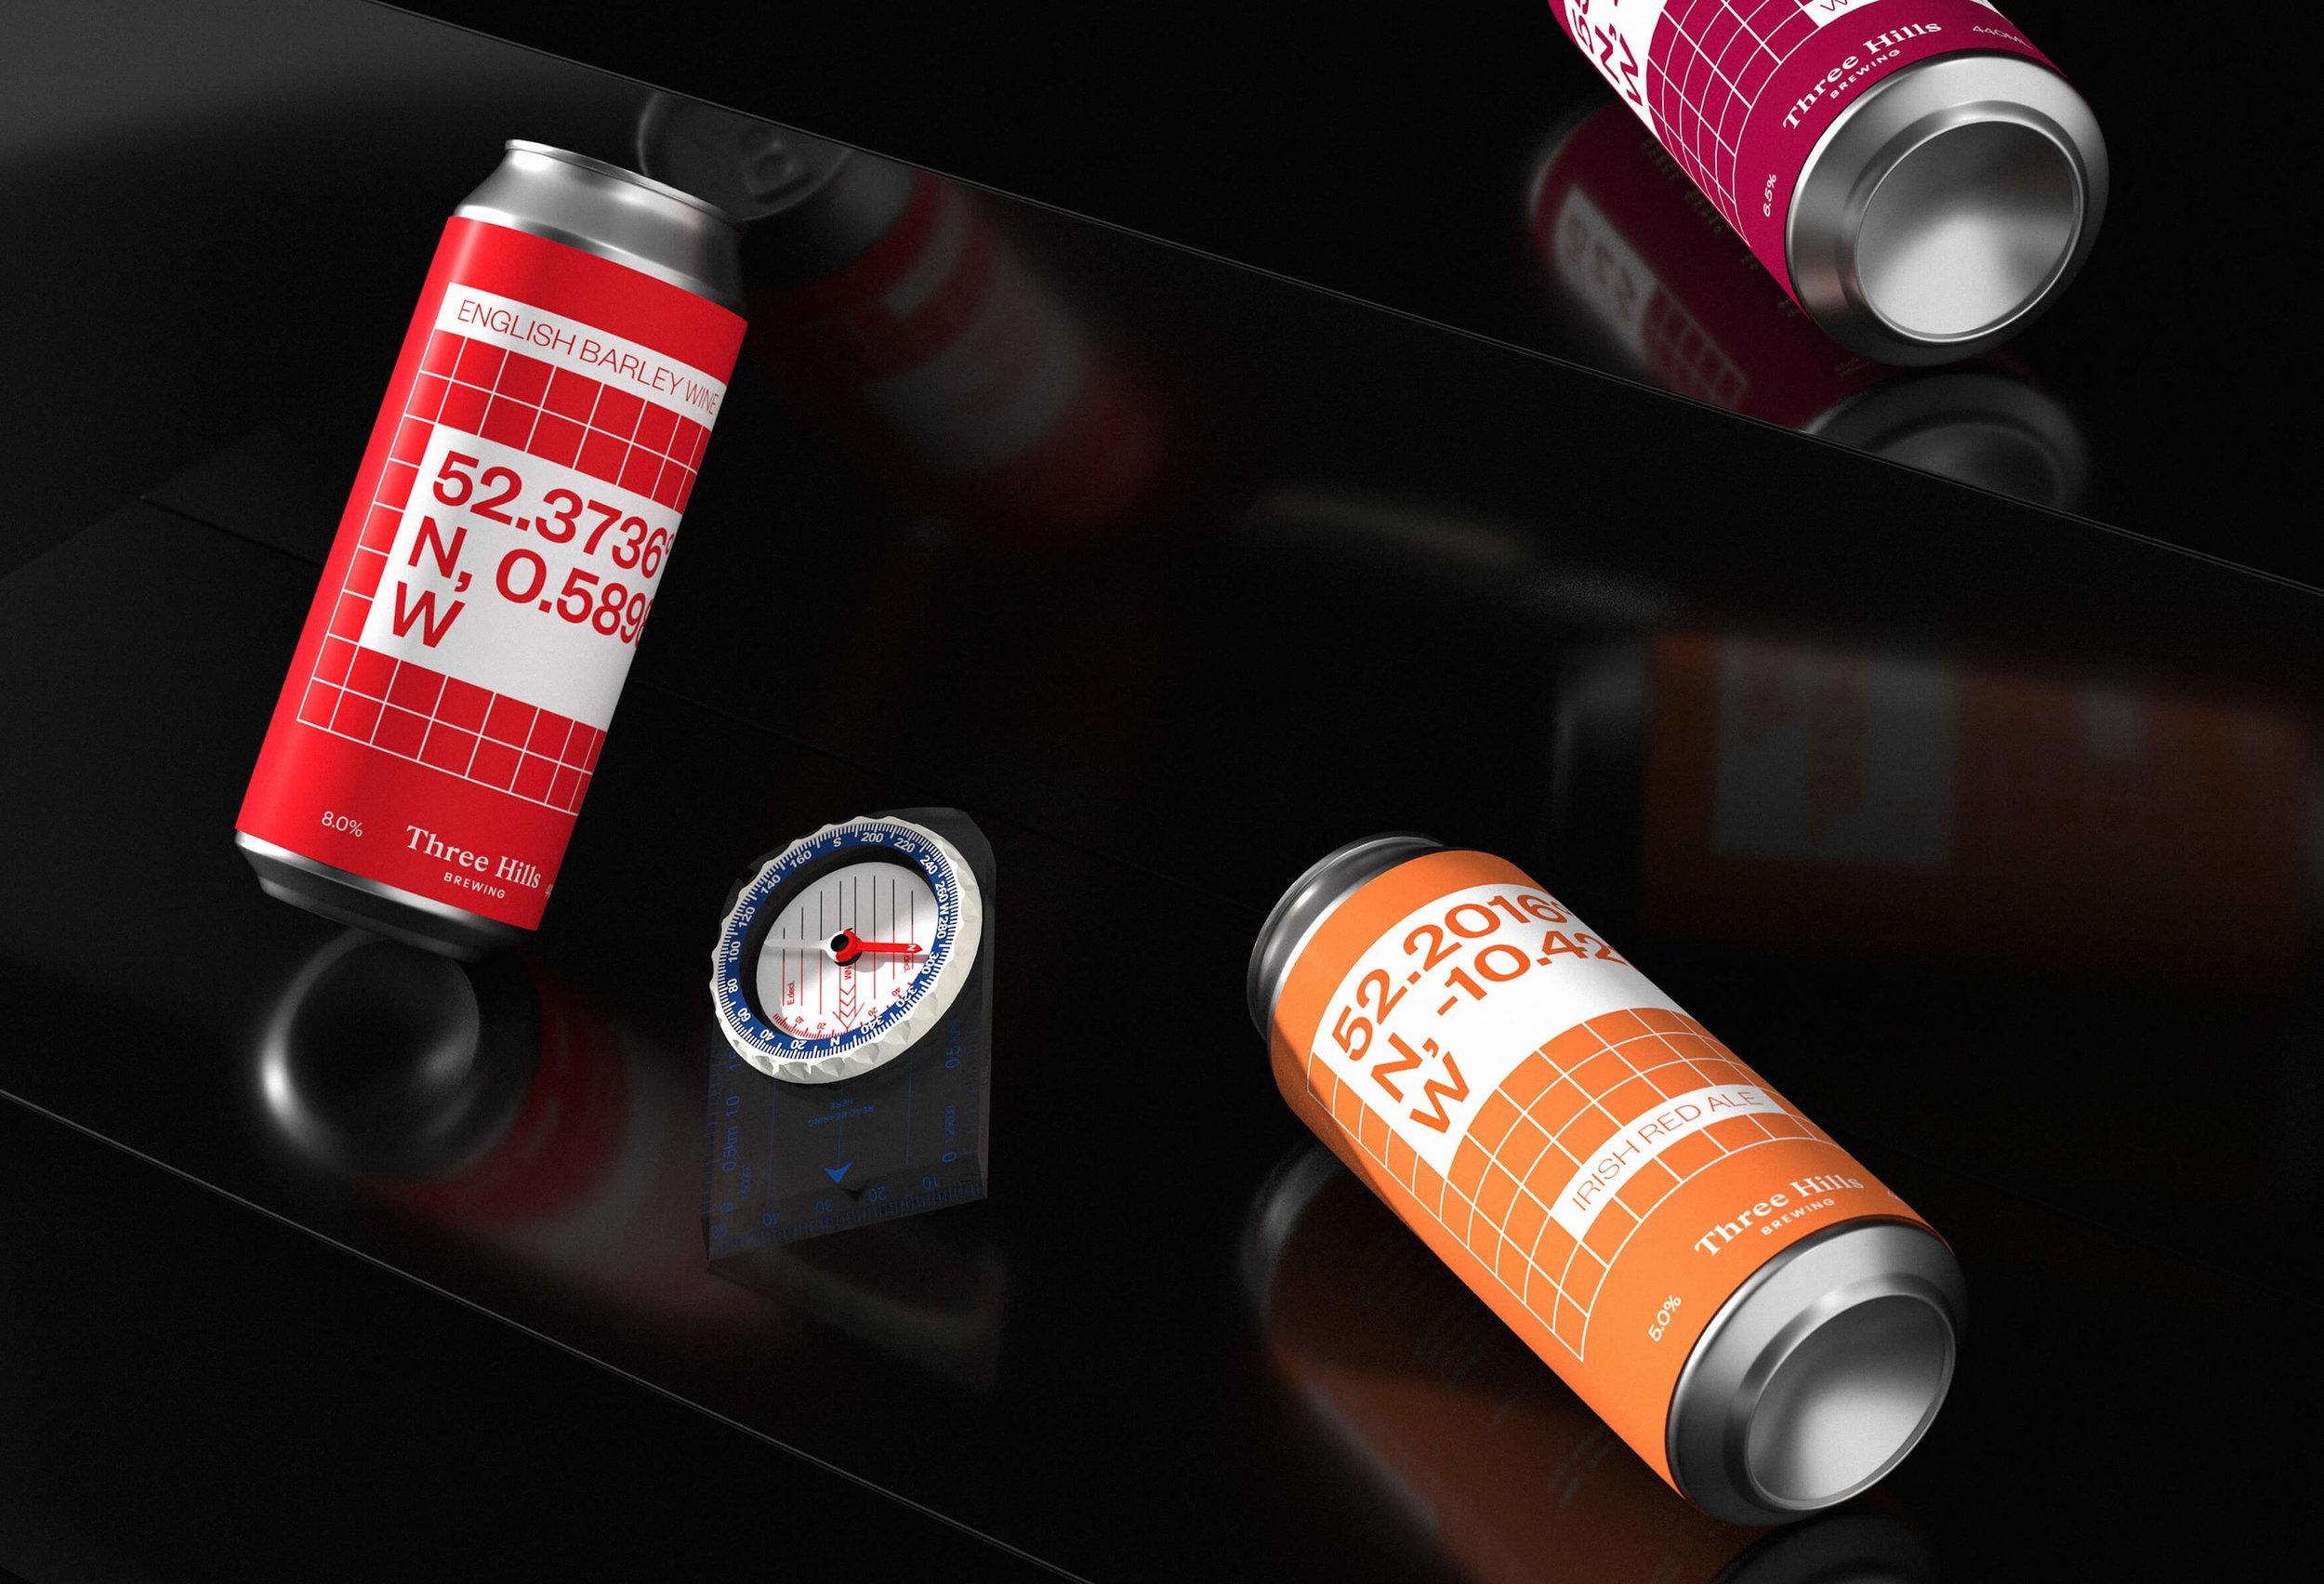 Three Hills Brewing Beer Cans Design / World Brand Design Society